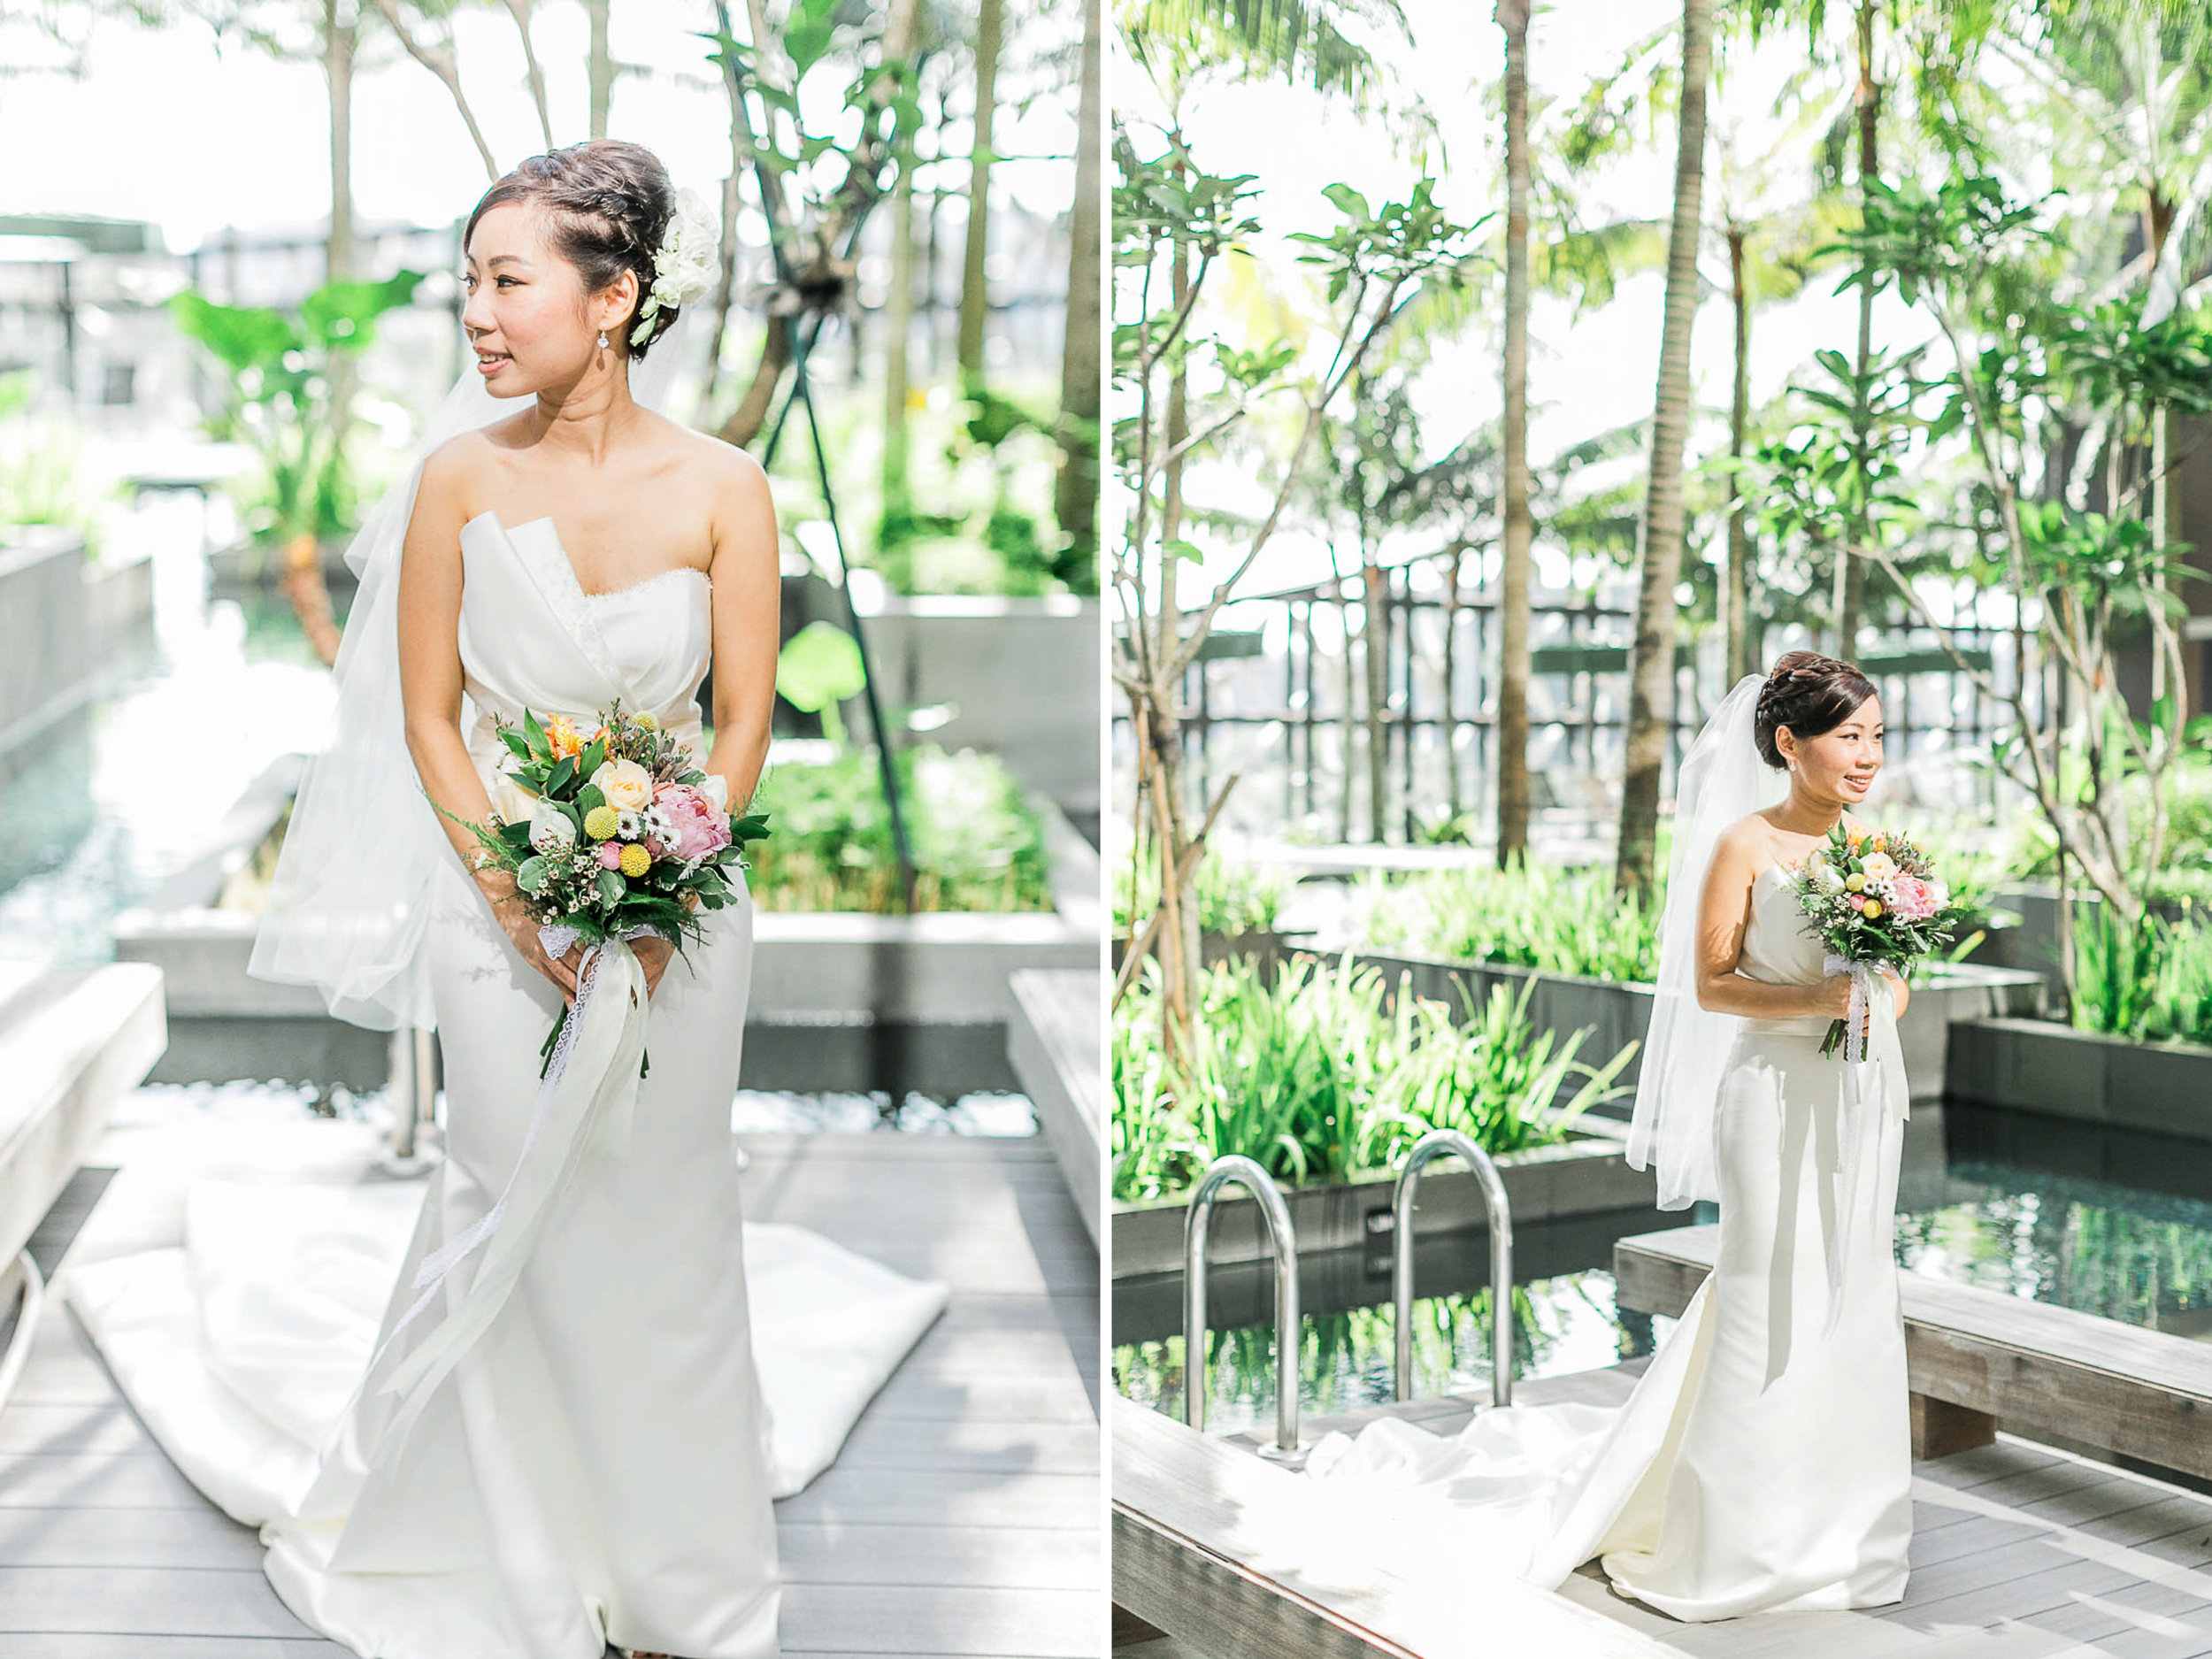 wedding-photographer-singapore-film-photographer-chen-sands-MinKang-wedding-2.jpg